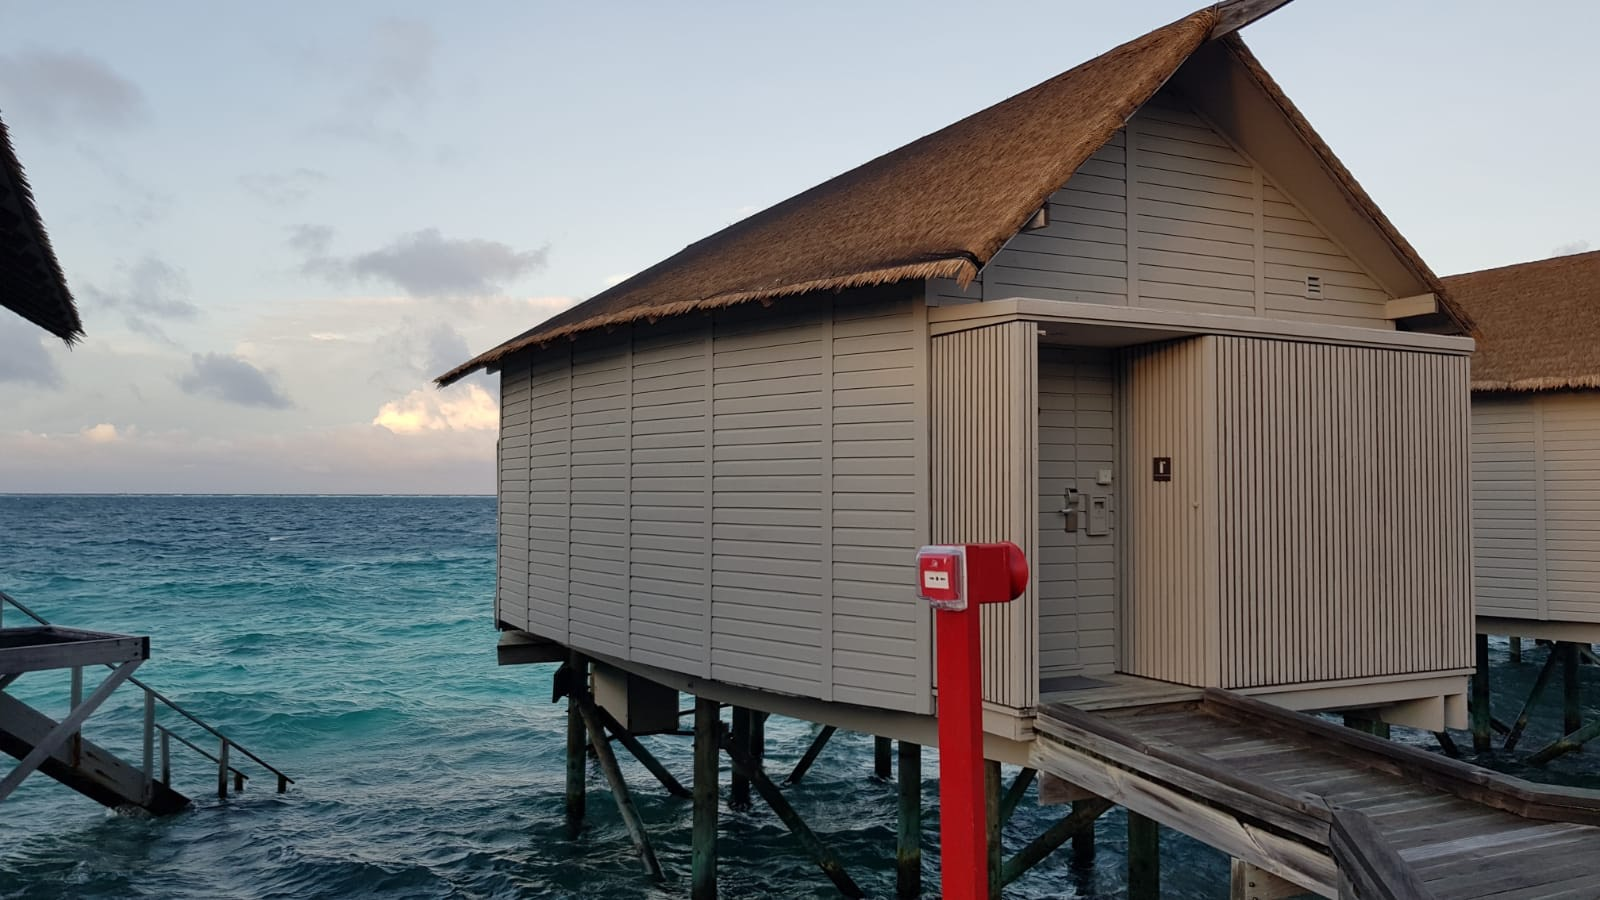 invite-to-paradise-sri-lanka-maldives-holiday-honeymoon-specialists-customer-guest-feedback-zane-lisa-butcher-centara-ras-fushi-deluxe-spa-water-villa-outside-jetty.png